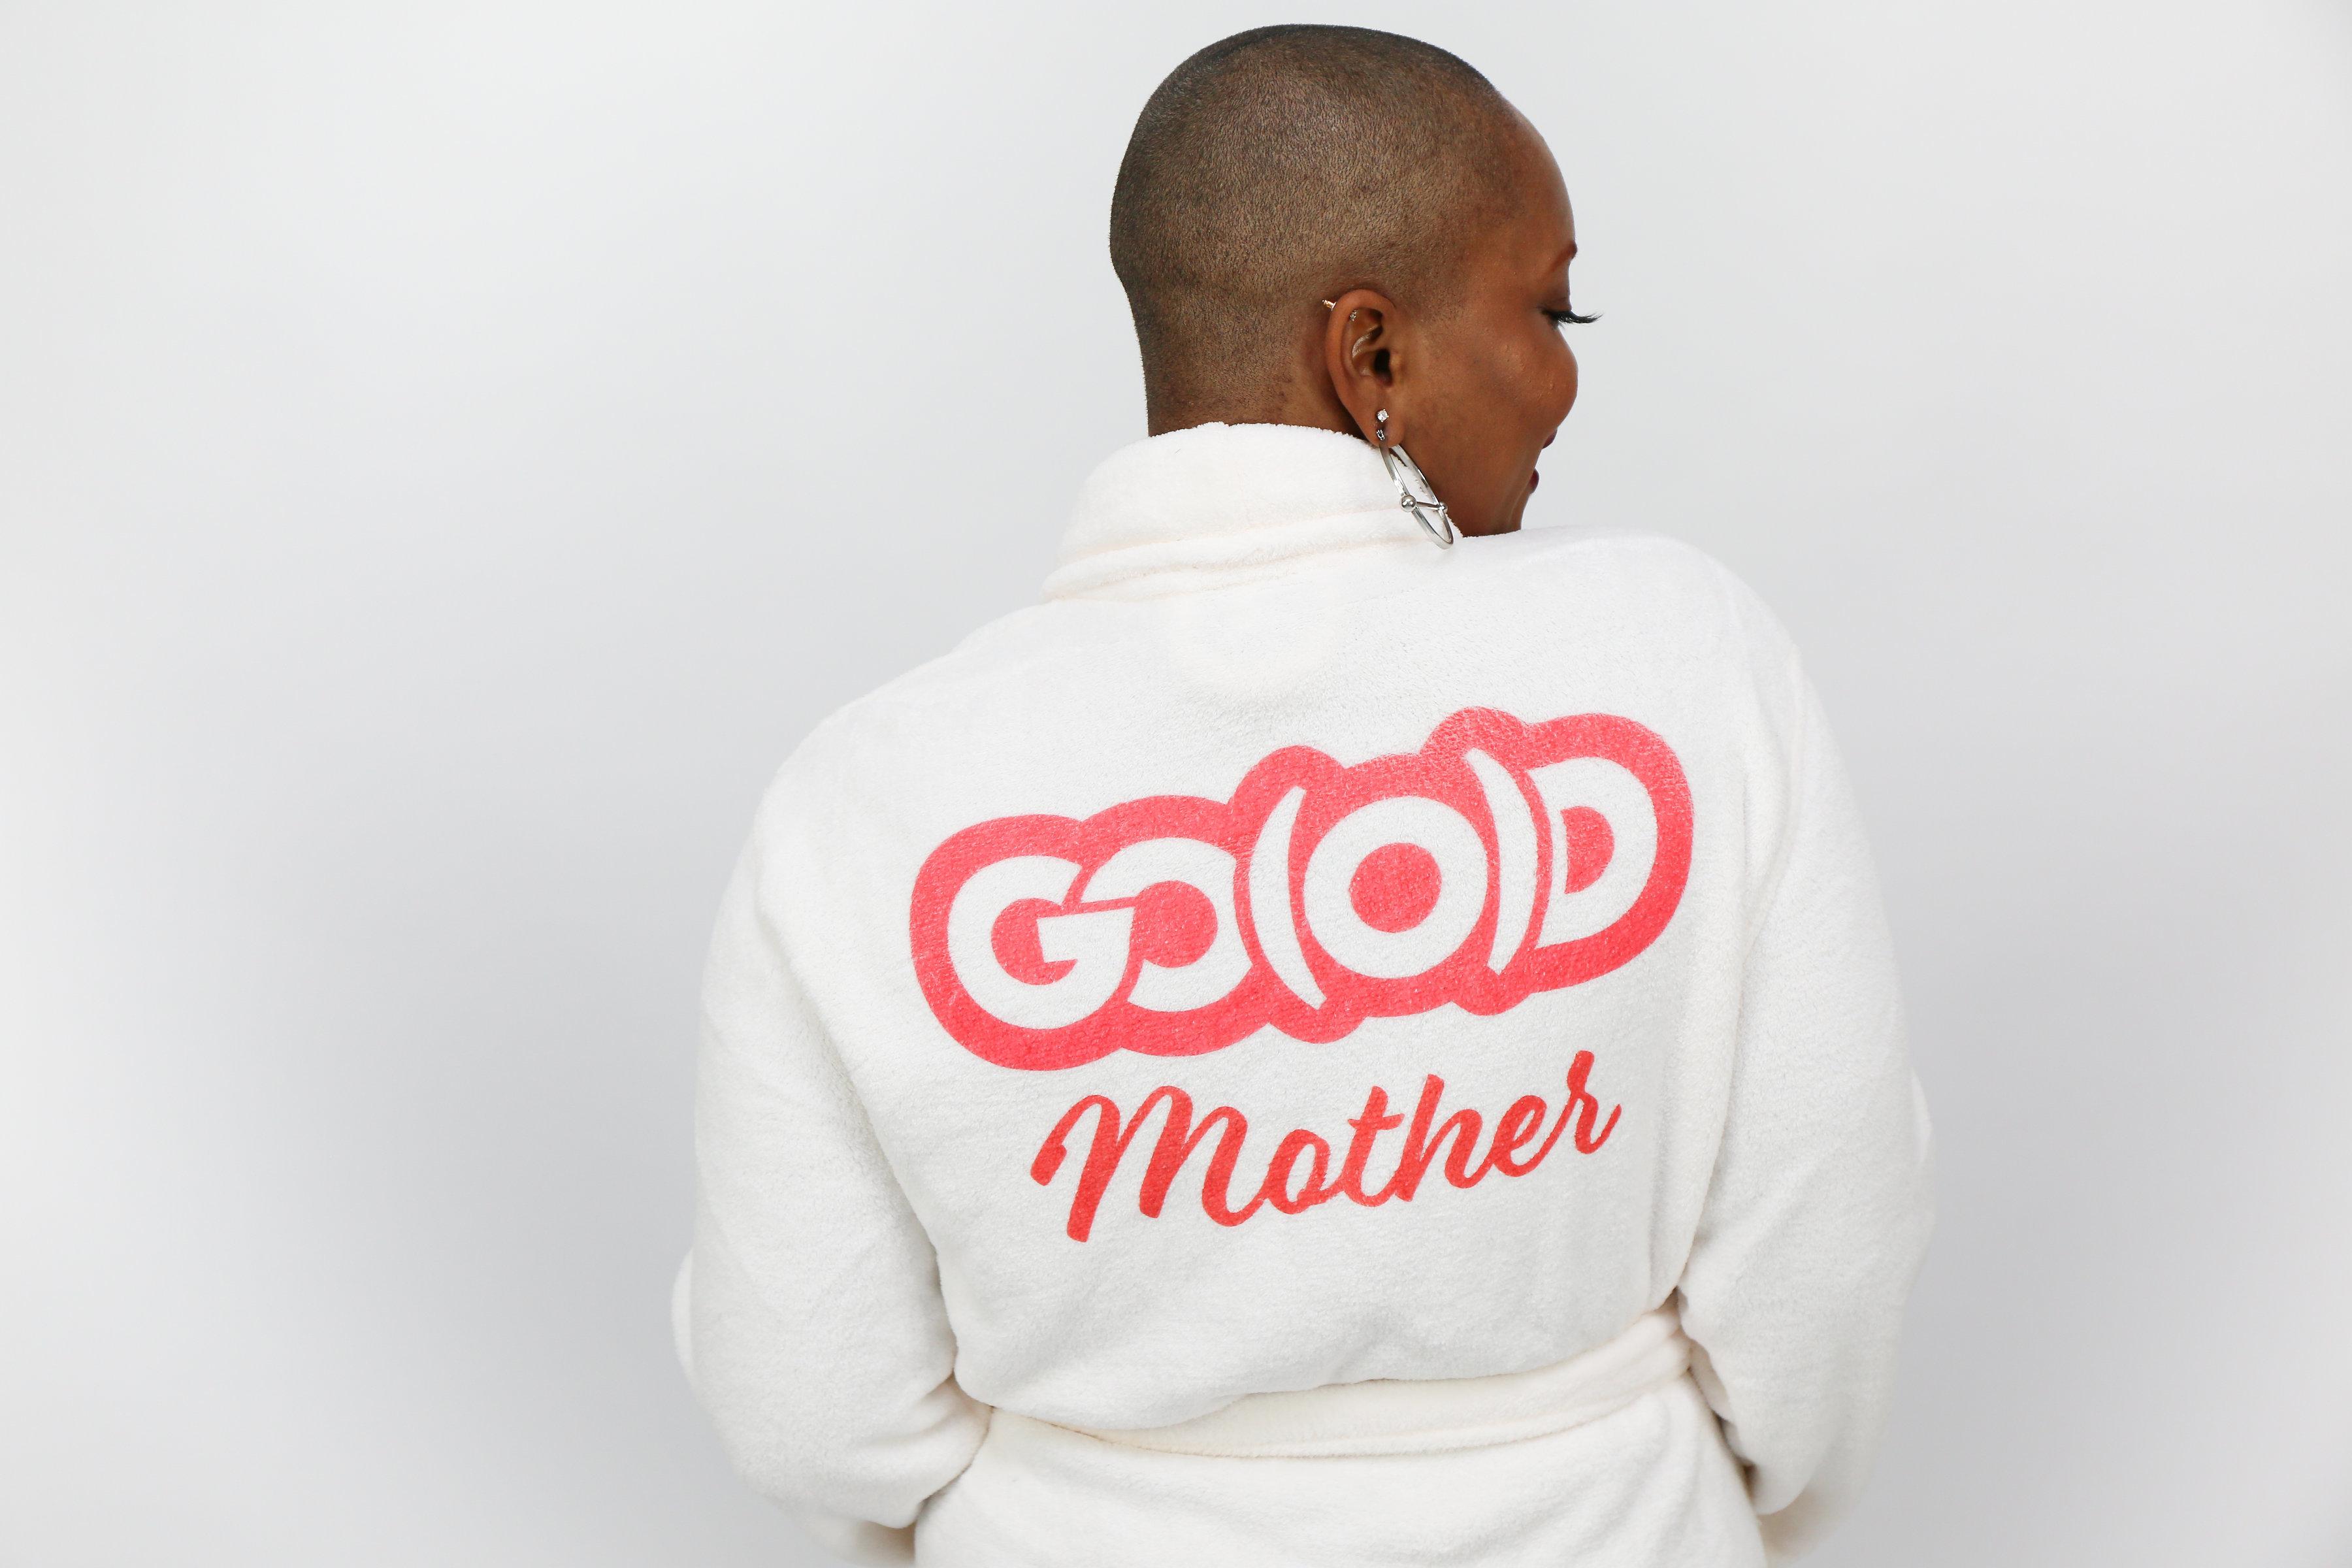 PLUSH GO(O)D Mother Robe-White/Red 00150